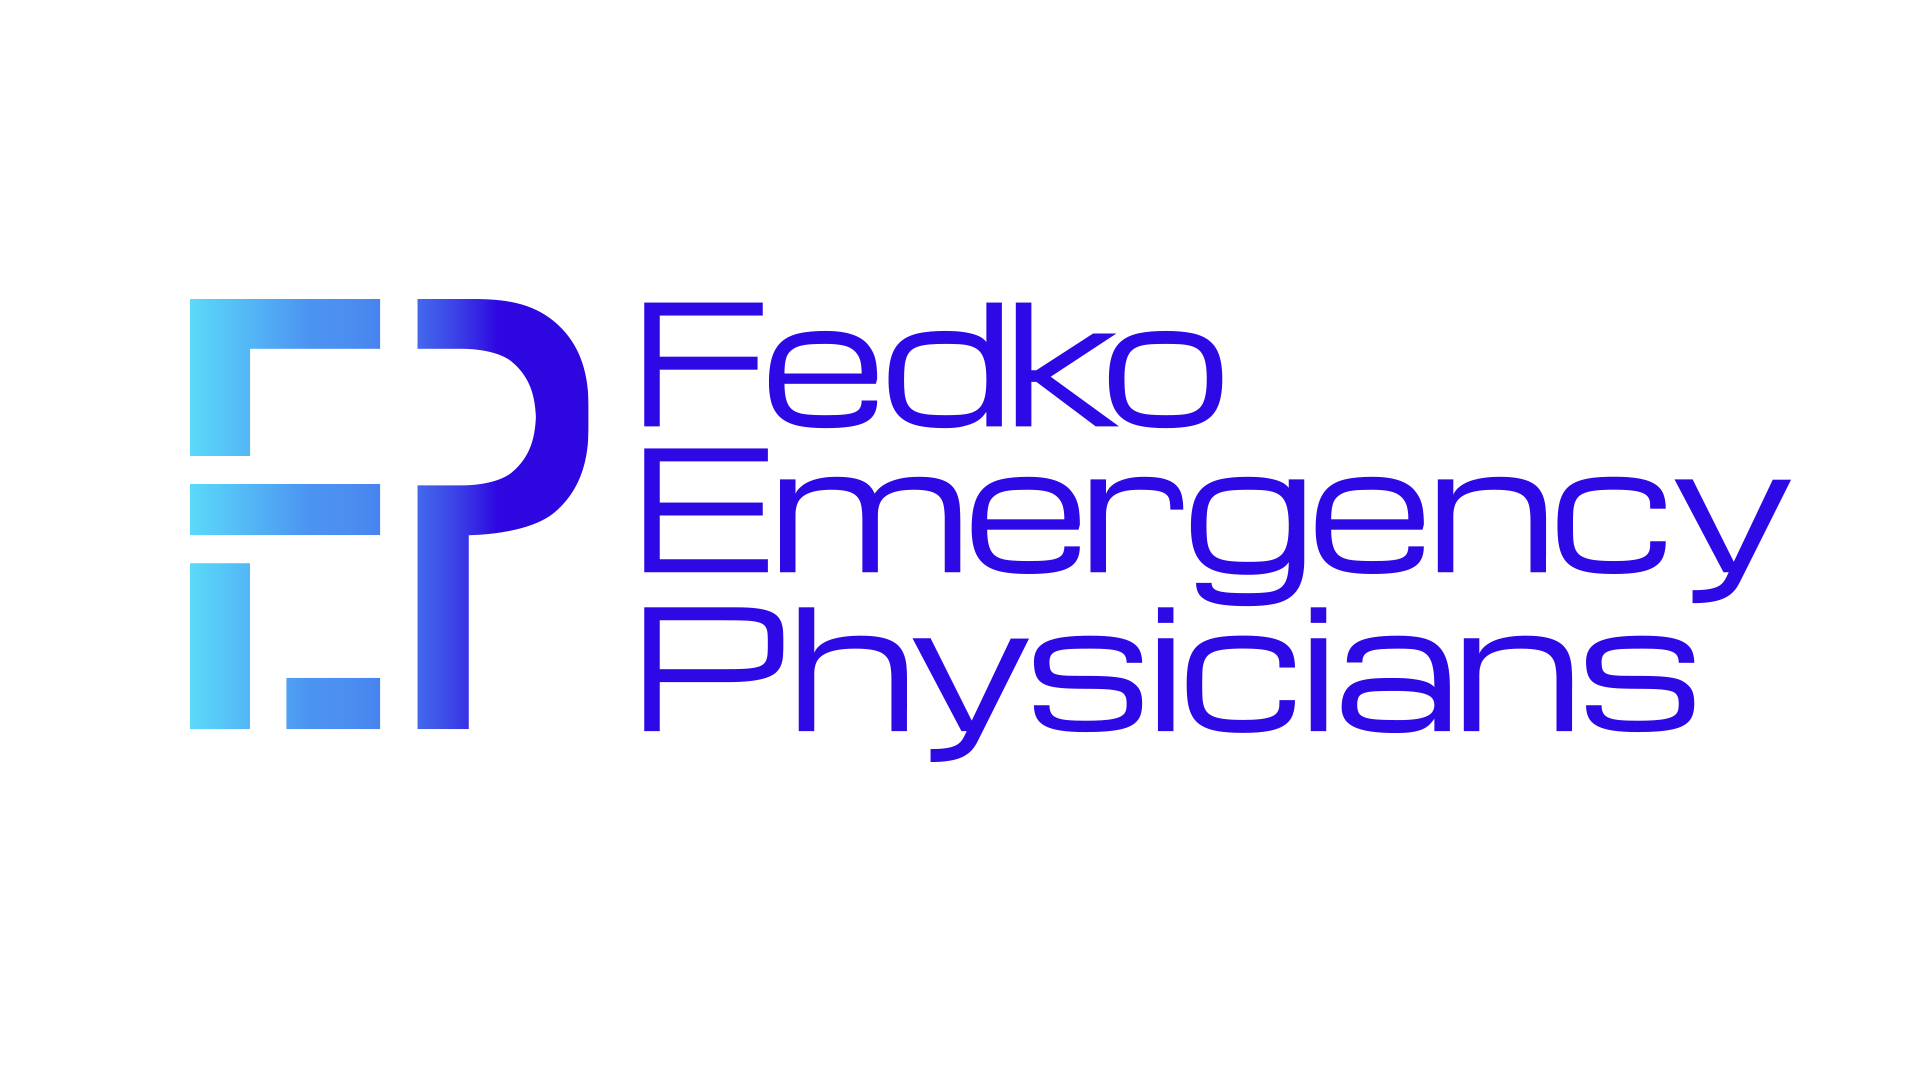 Fedko Emergency Physicians